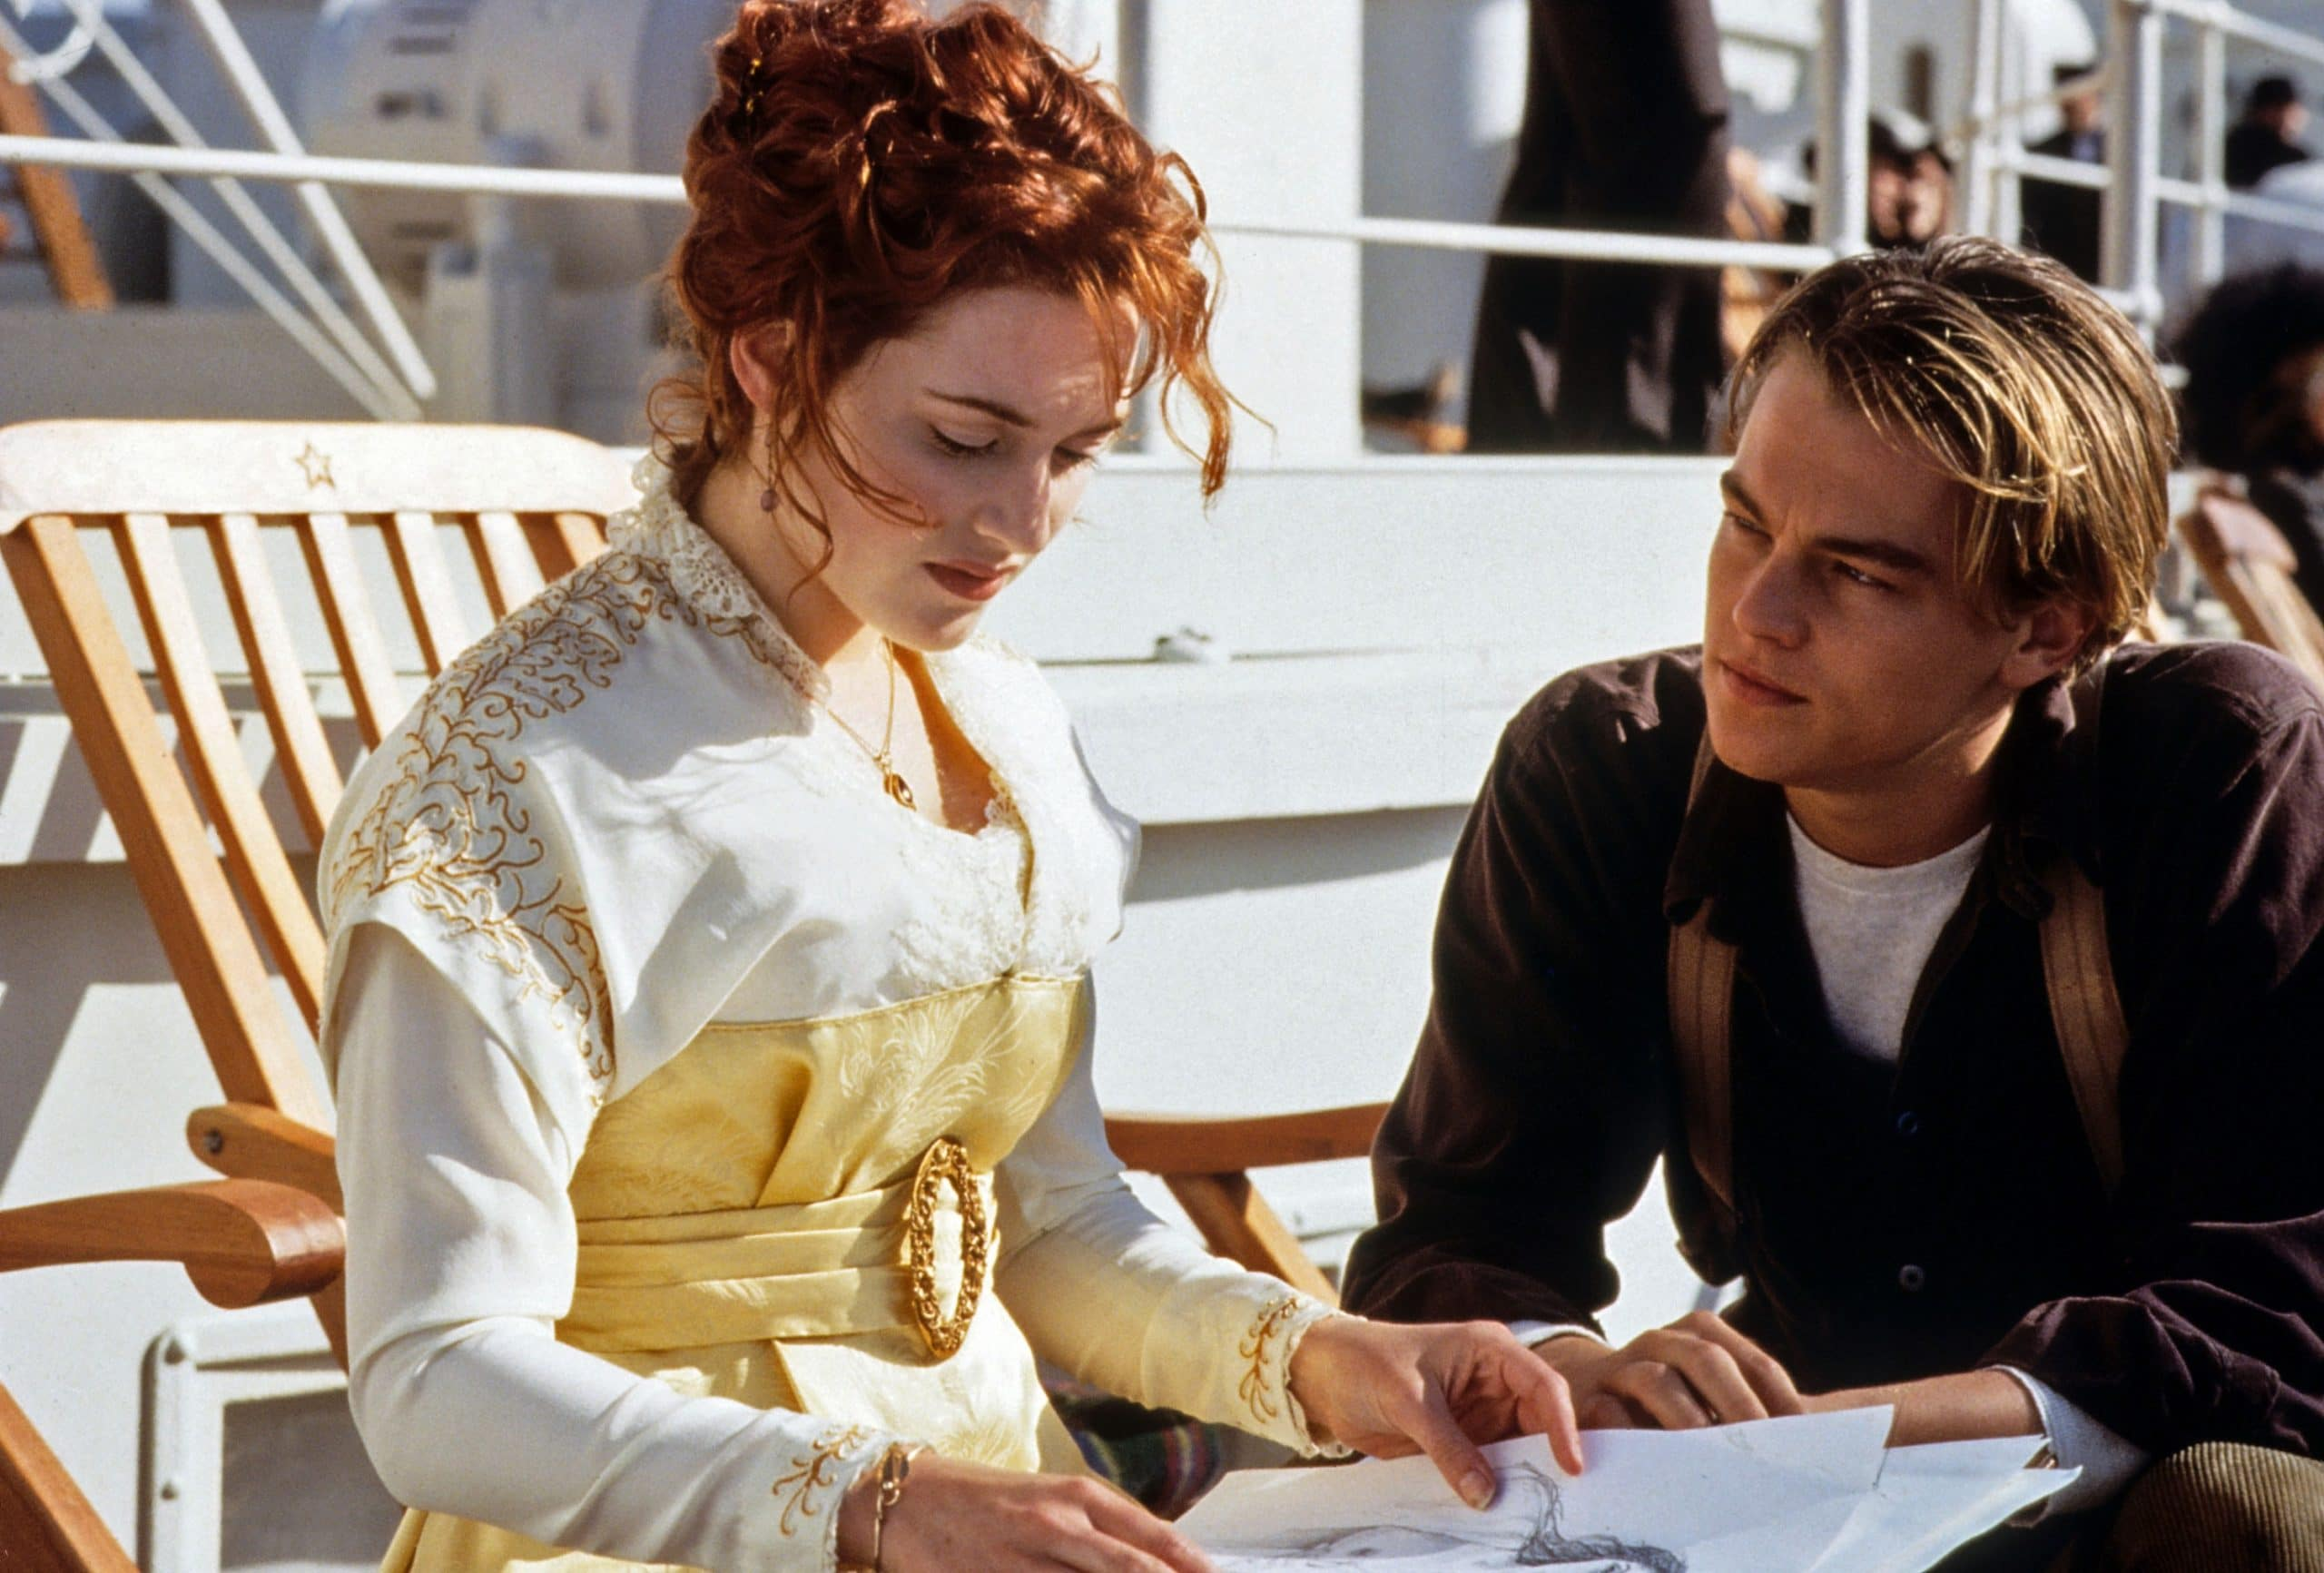 TITANIC, from left: Kate Winslet, Leonardo DiCaprio